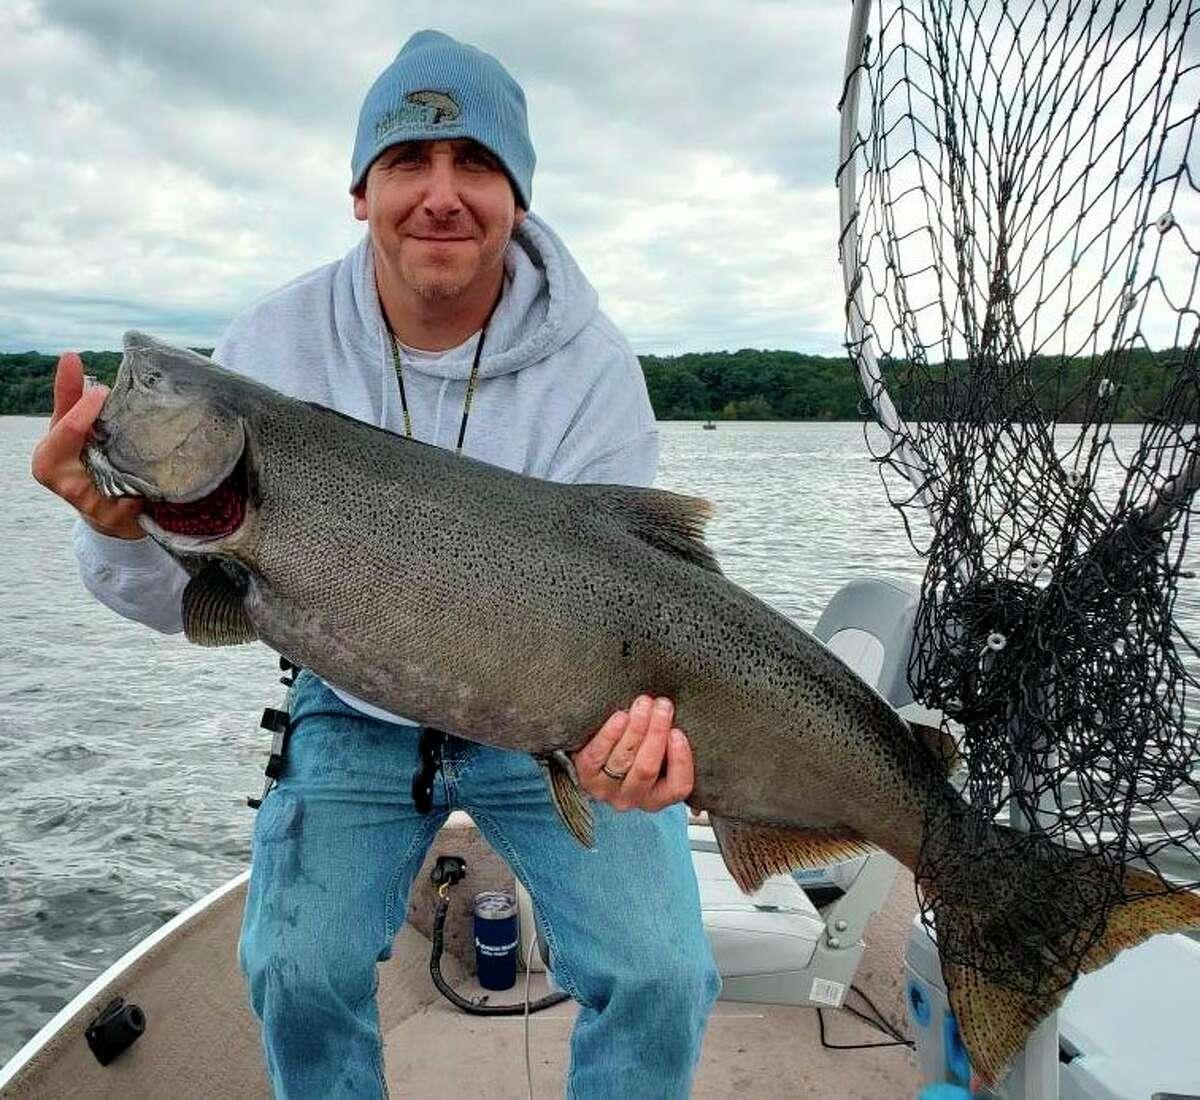 Evart's Paul Higgins has had an outstanding fishing season so far. (Courtesy photo)